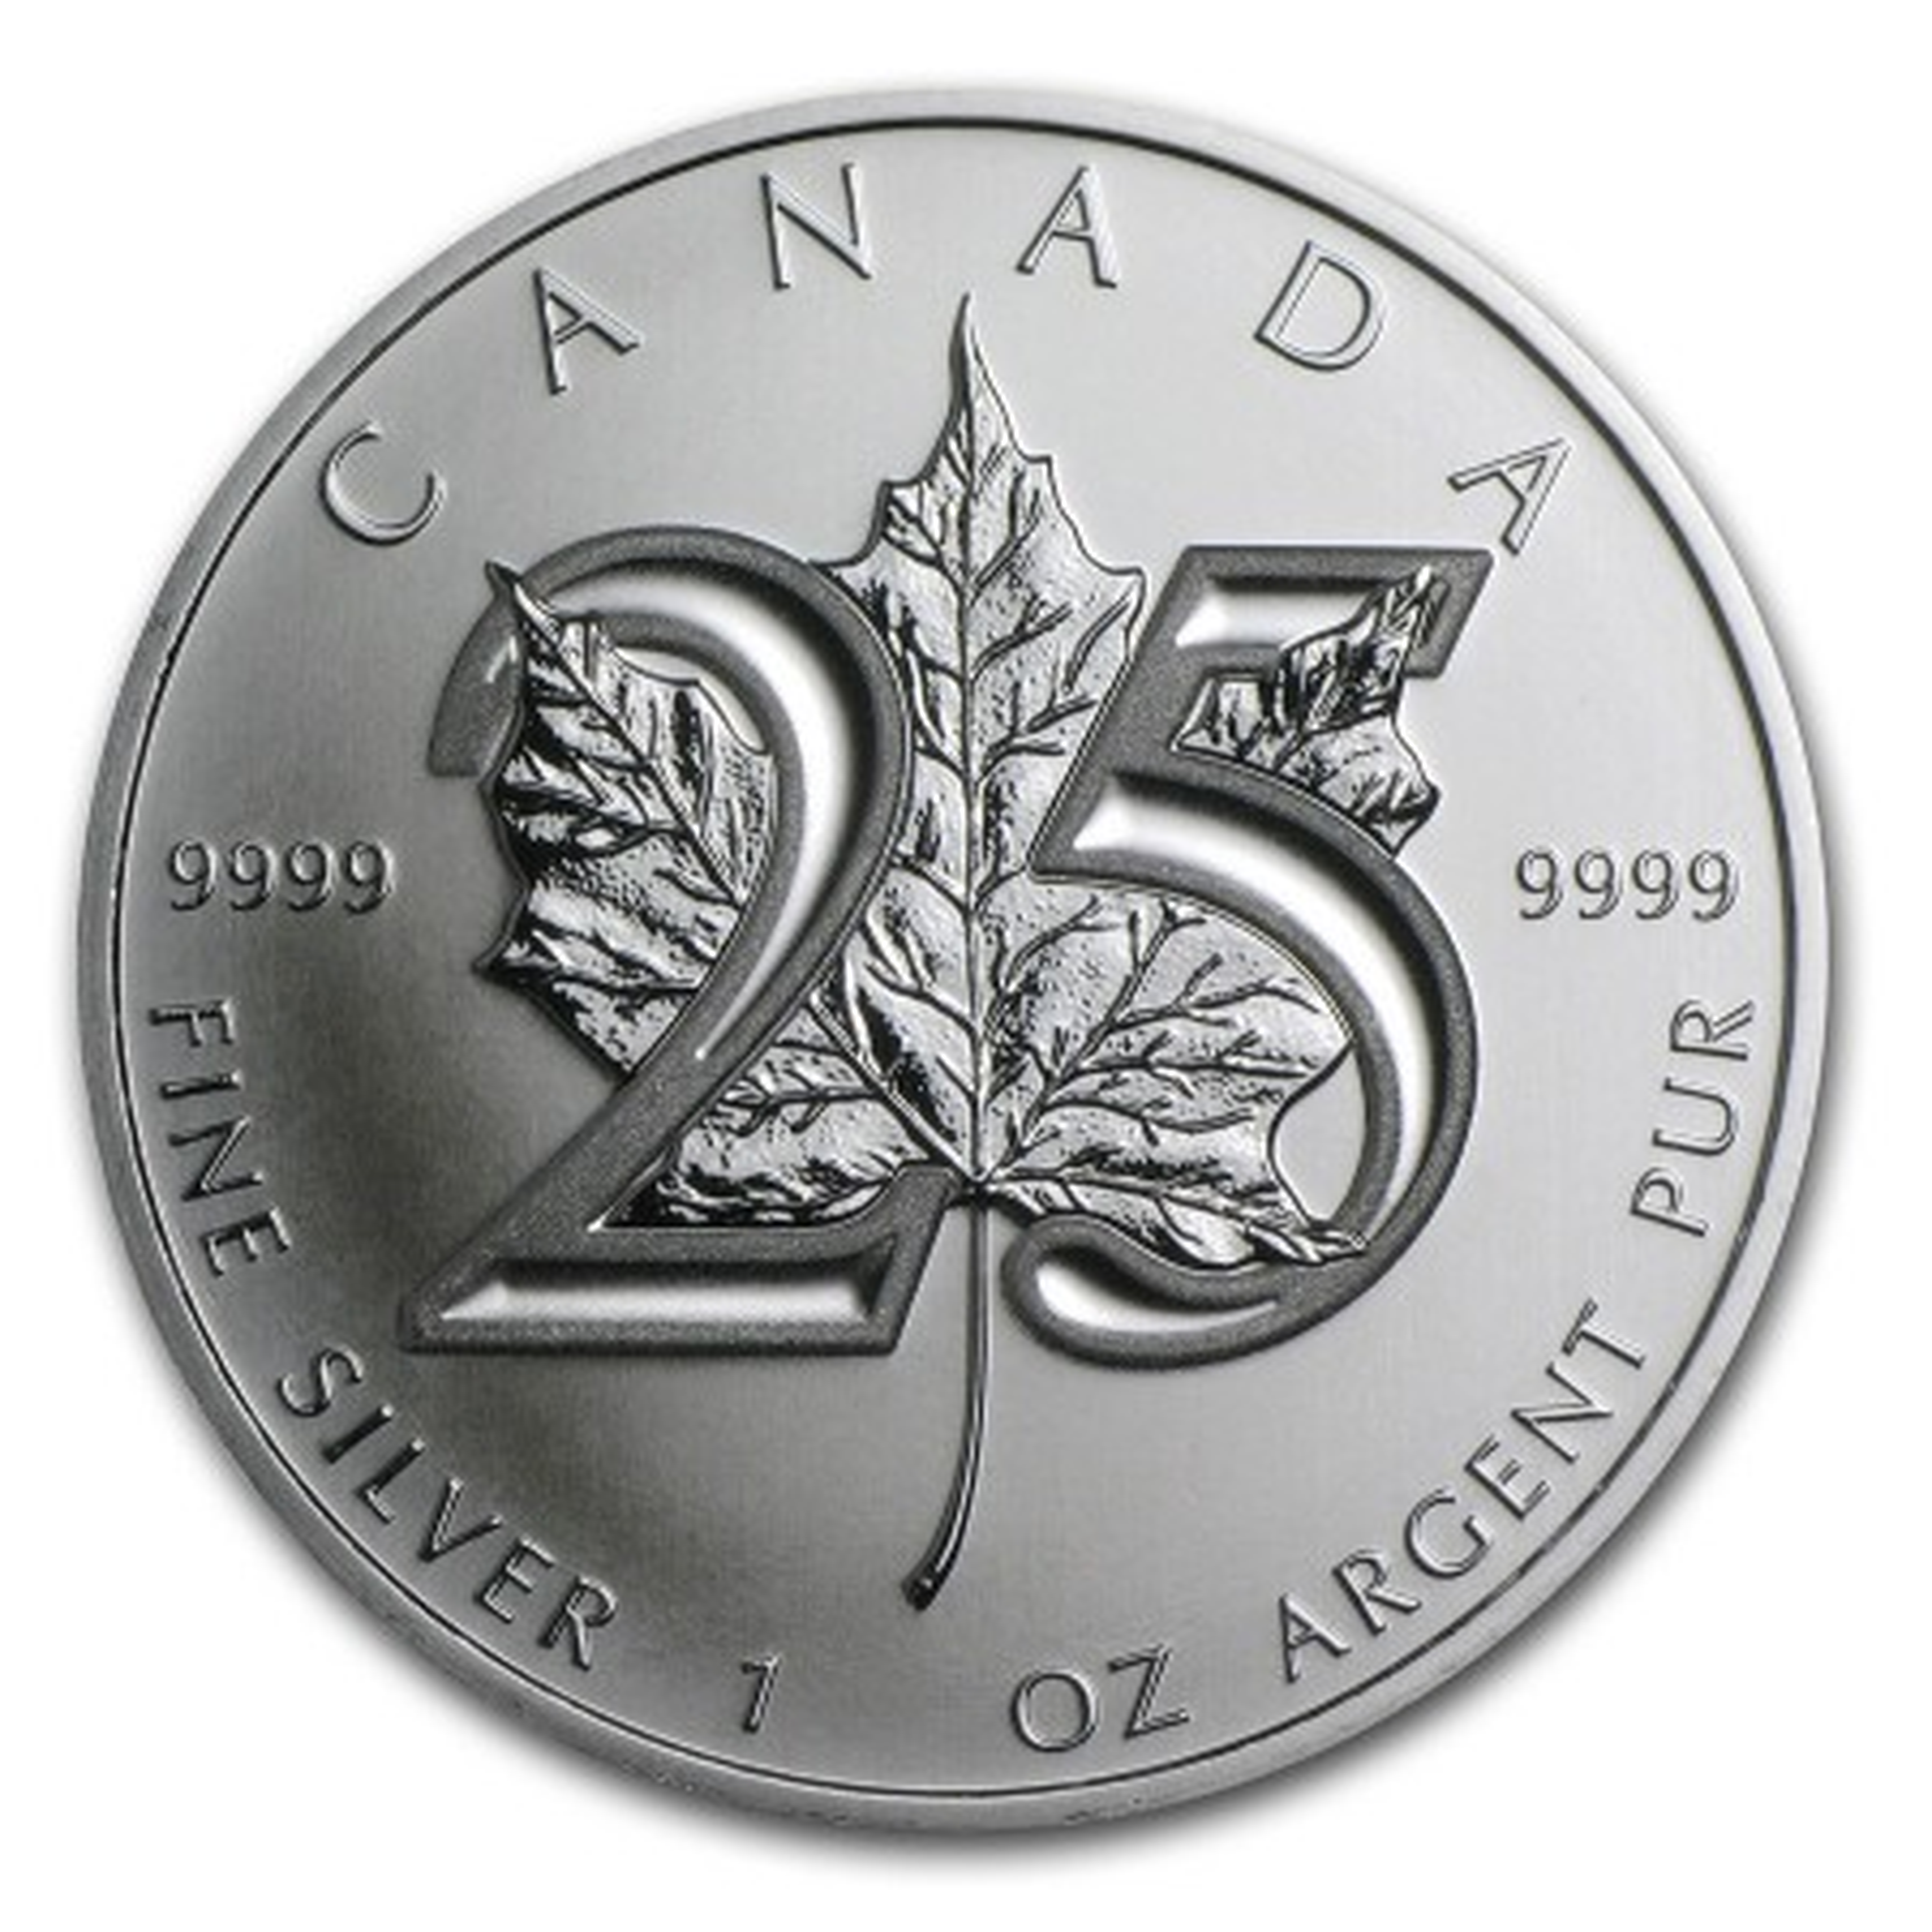 Maple Leaf zilver jubileum munt 25 jaar